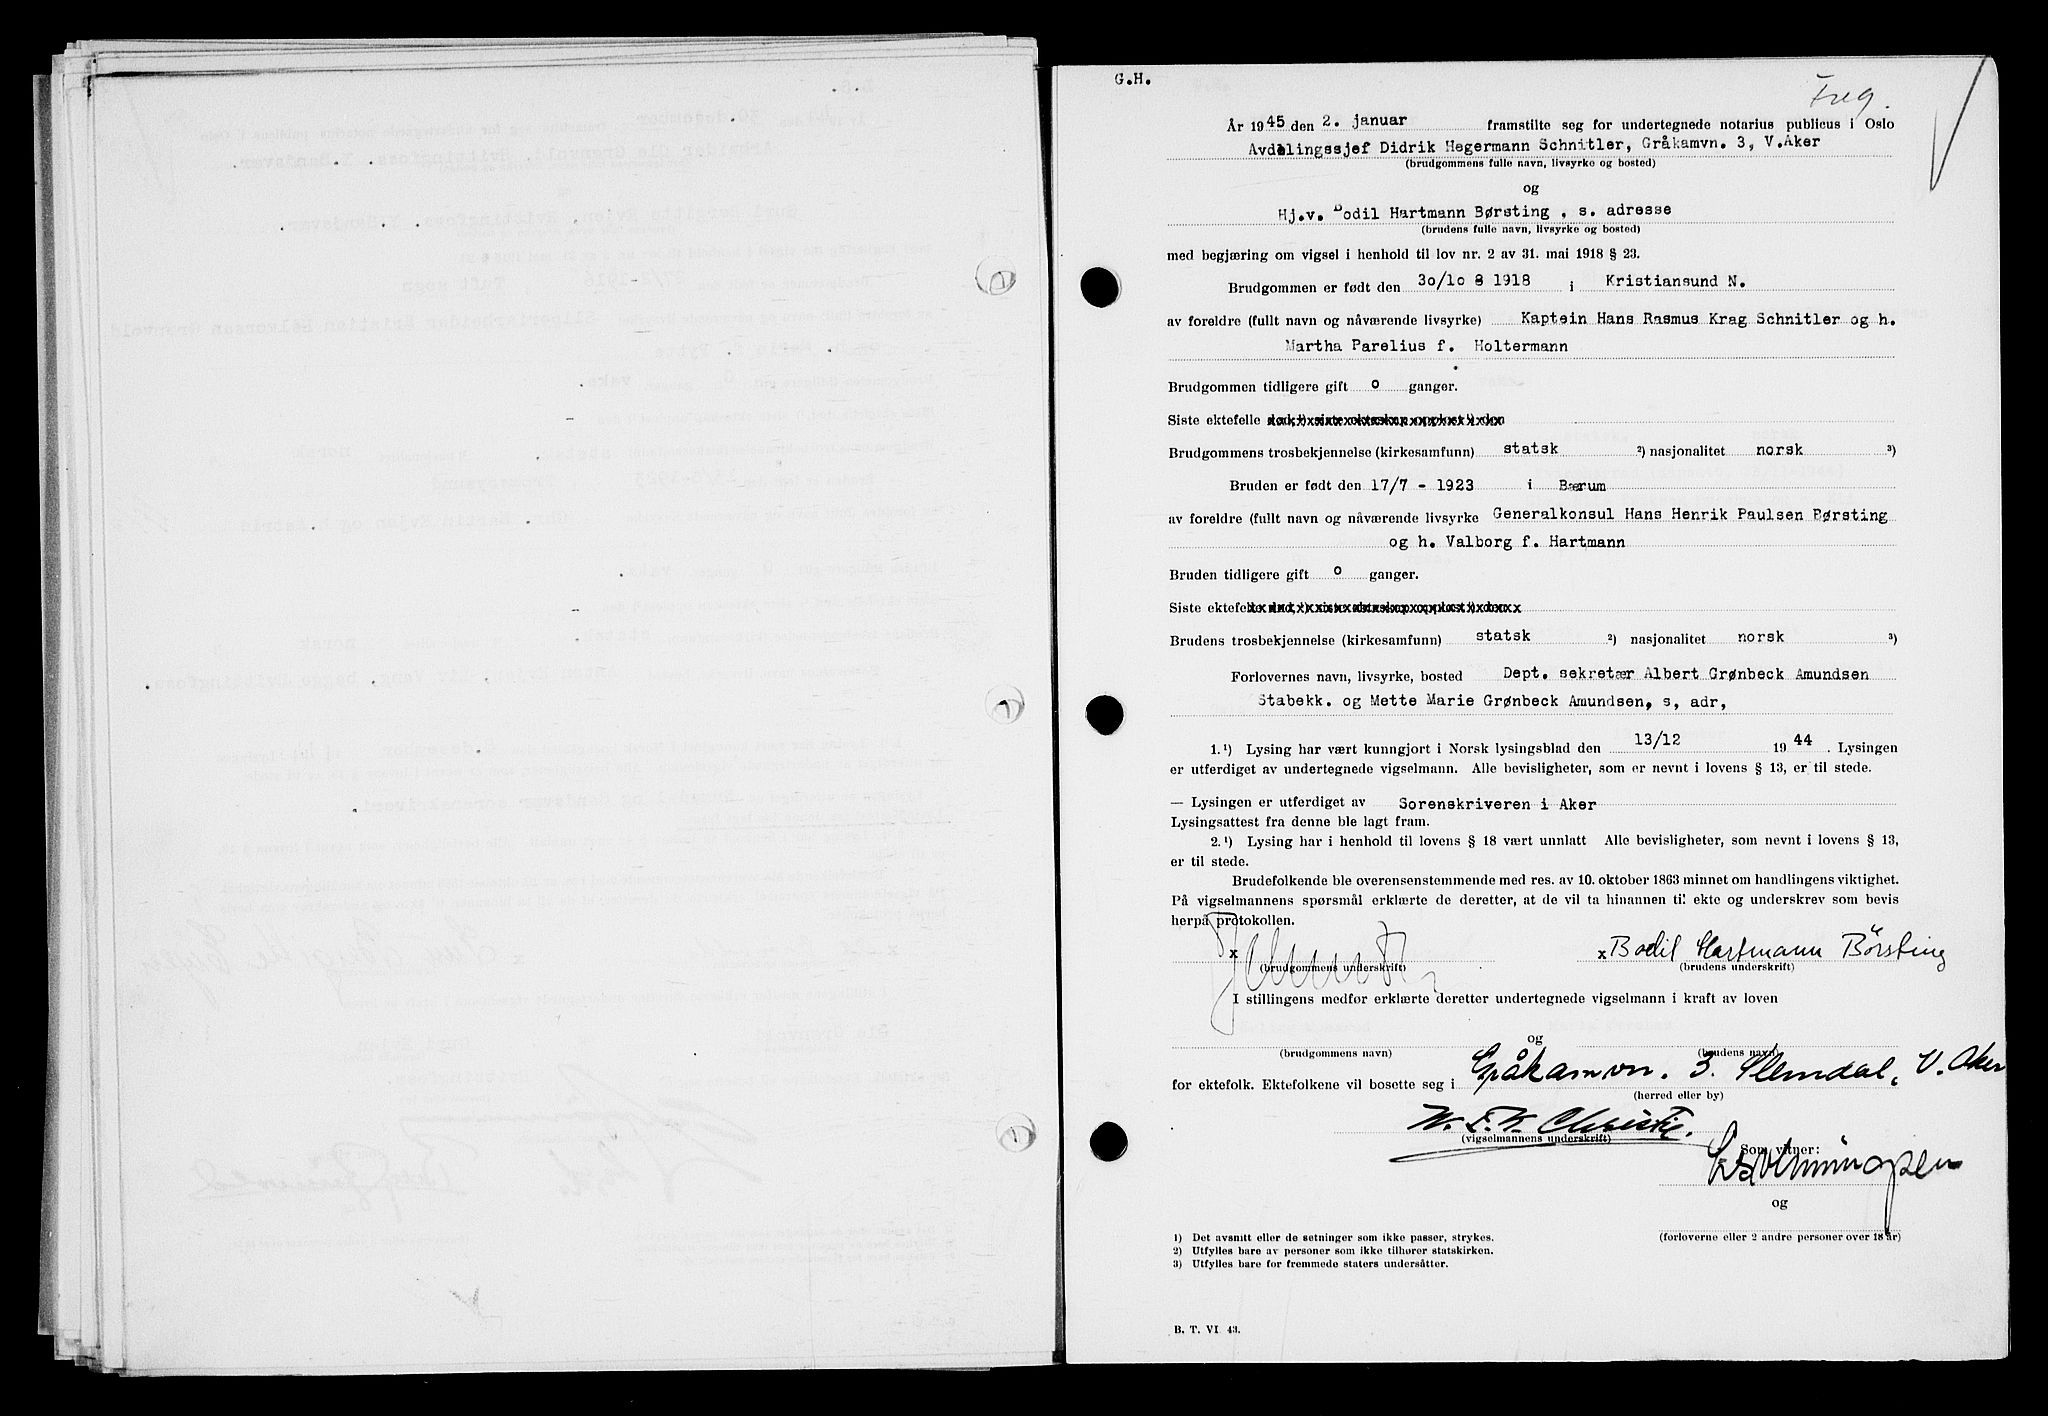 SAO, Oslo byfogd avd. I, L/Lb/Lbb/L0052: Notarialprotokoll, rekke II: Vigsler, 1944-1945, s. upaginert